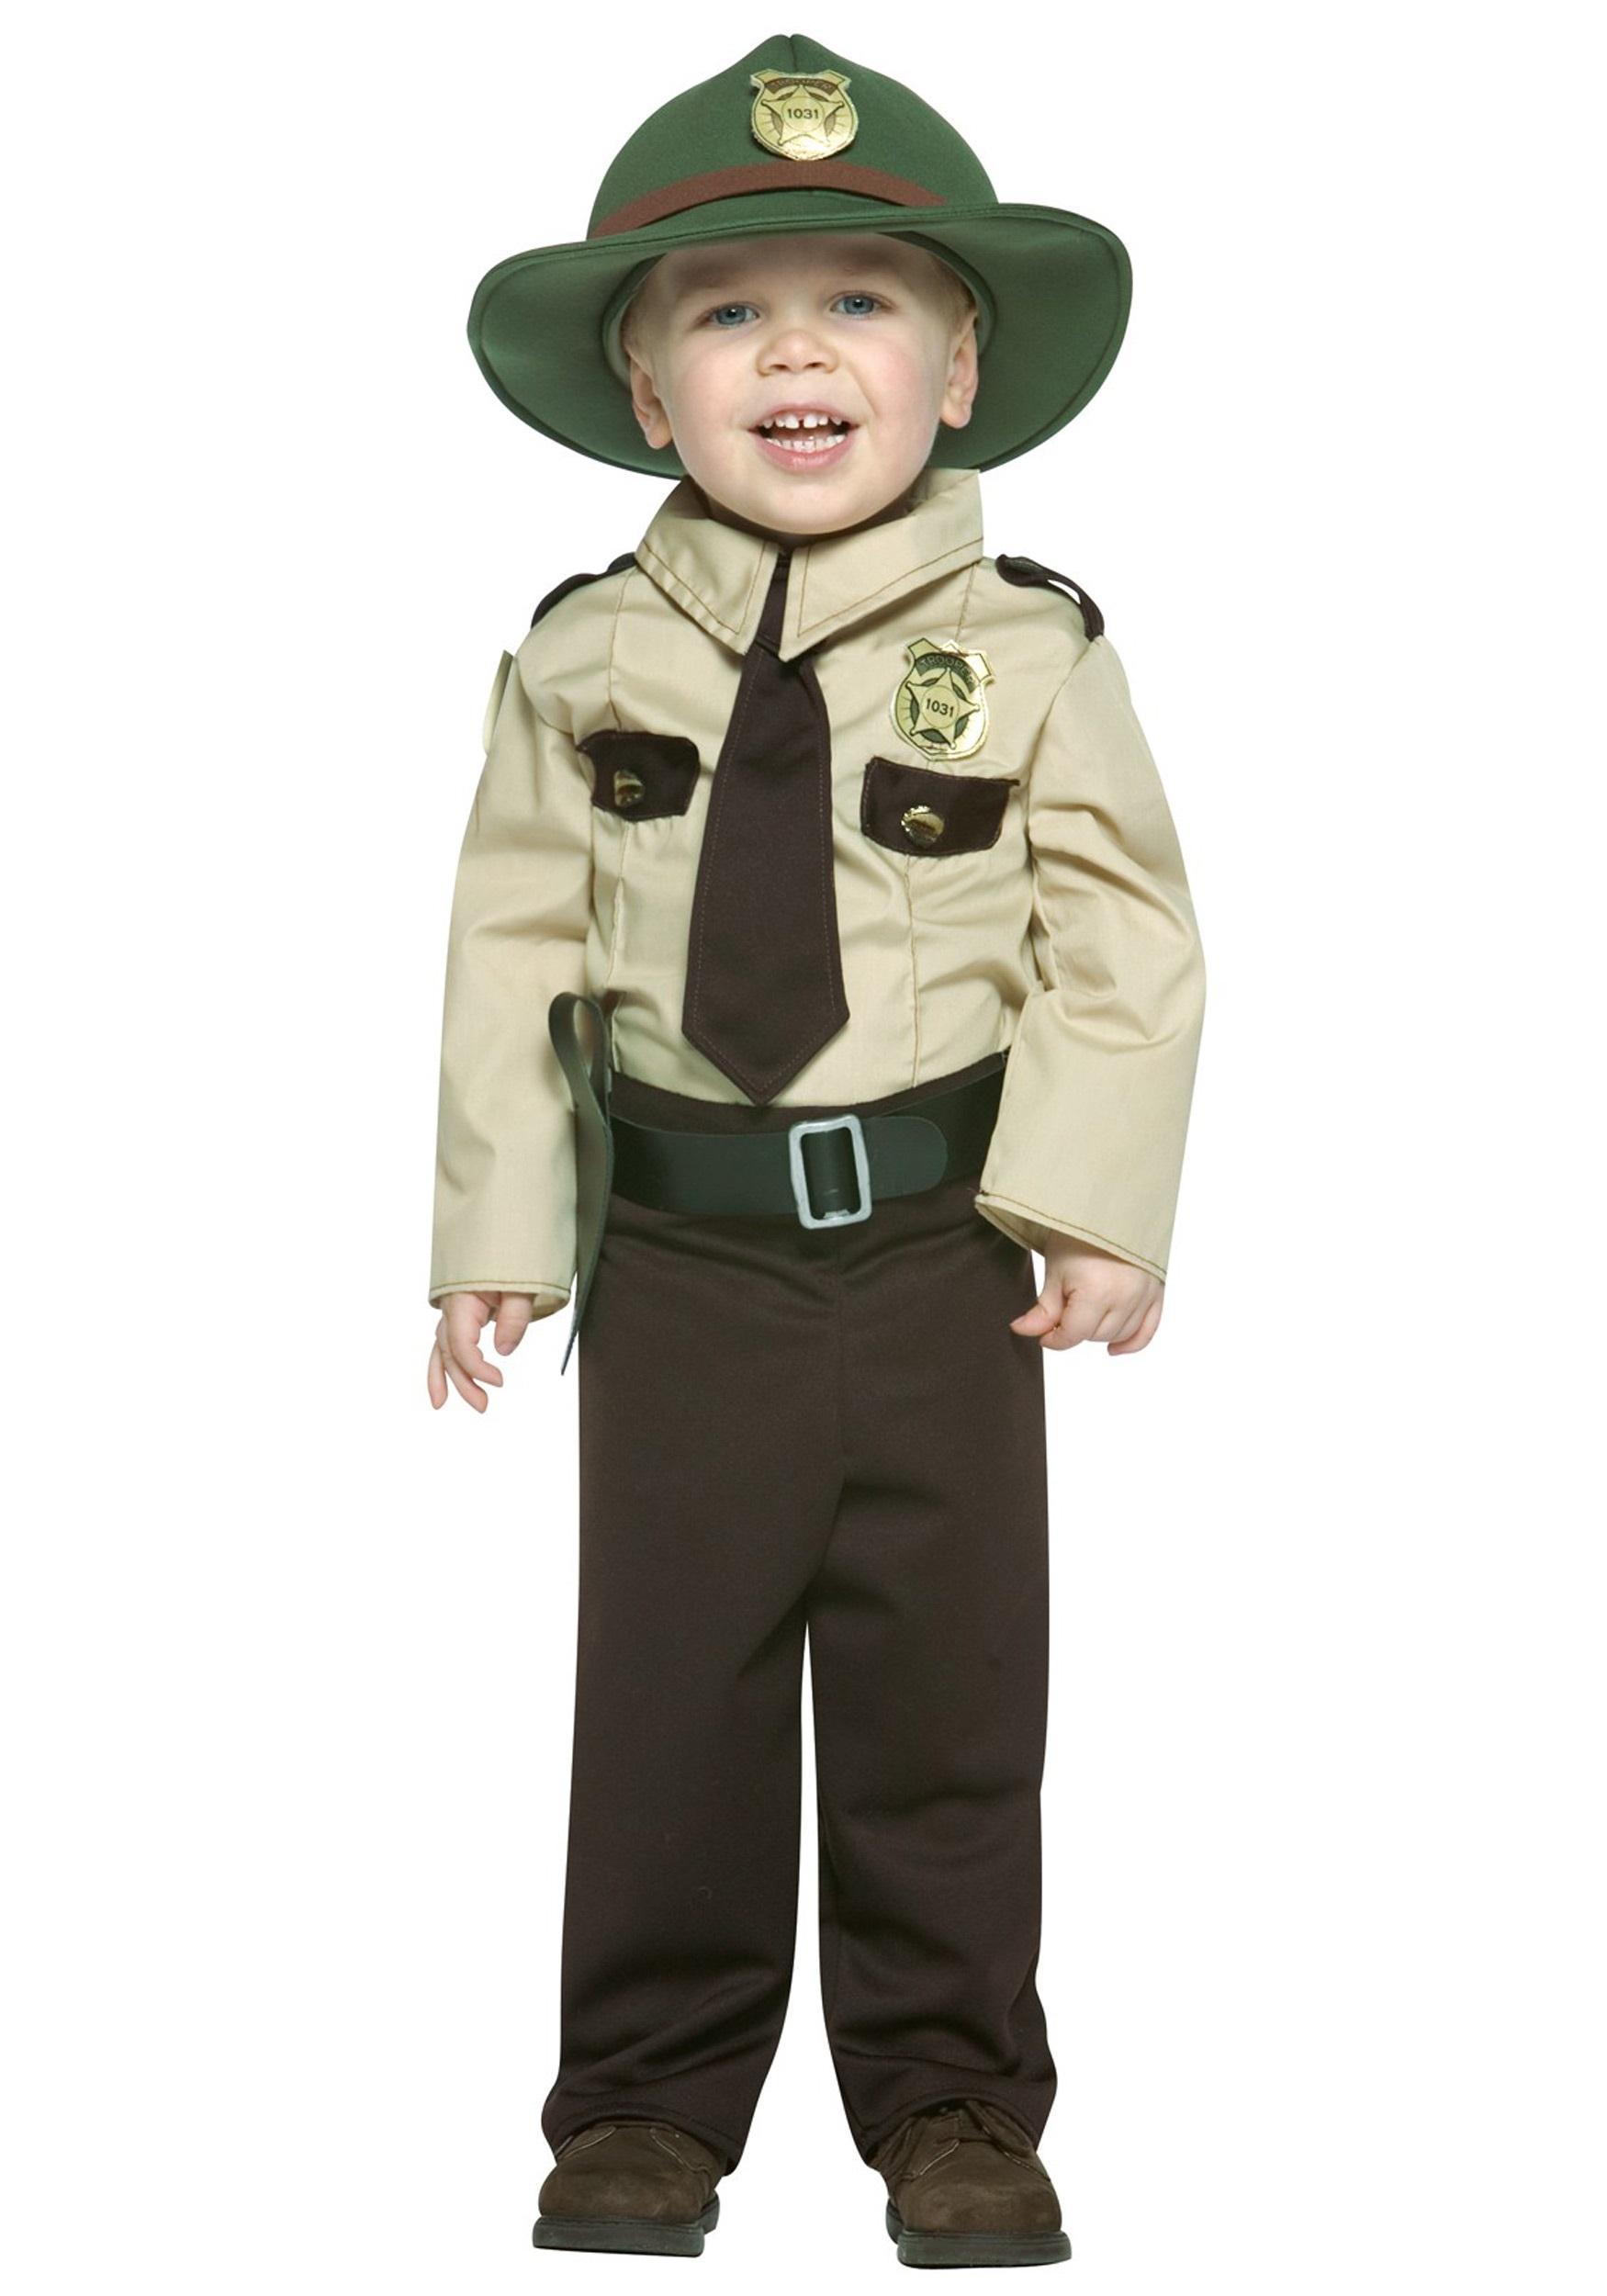 Toddler State Trooper Costume Toddler Uniform Halloween